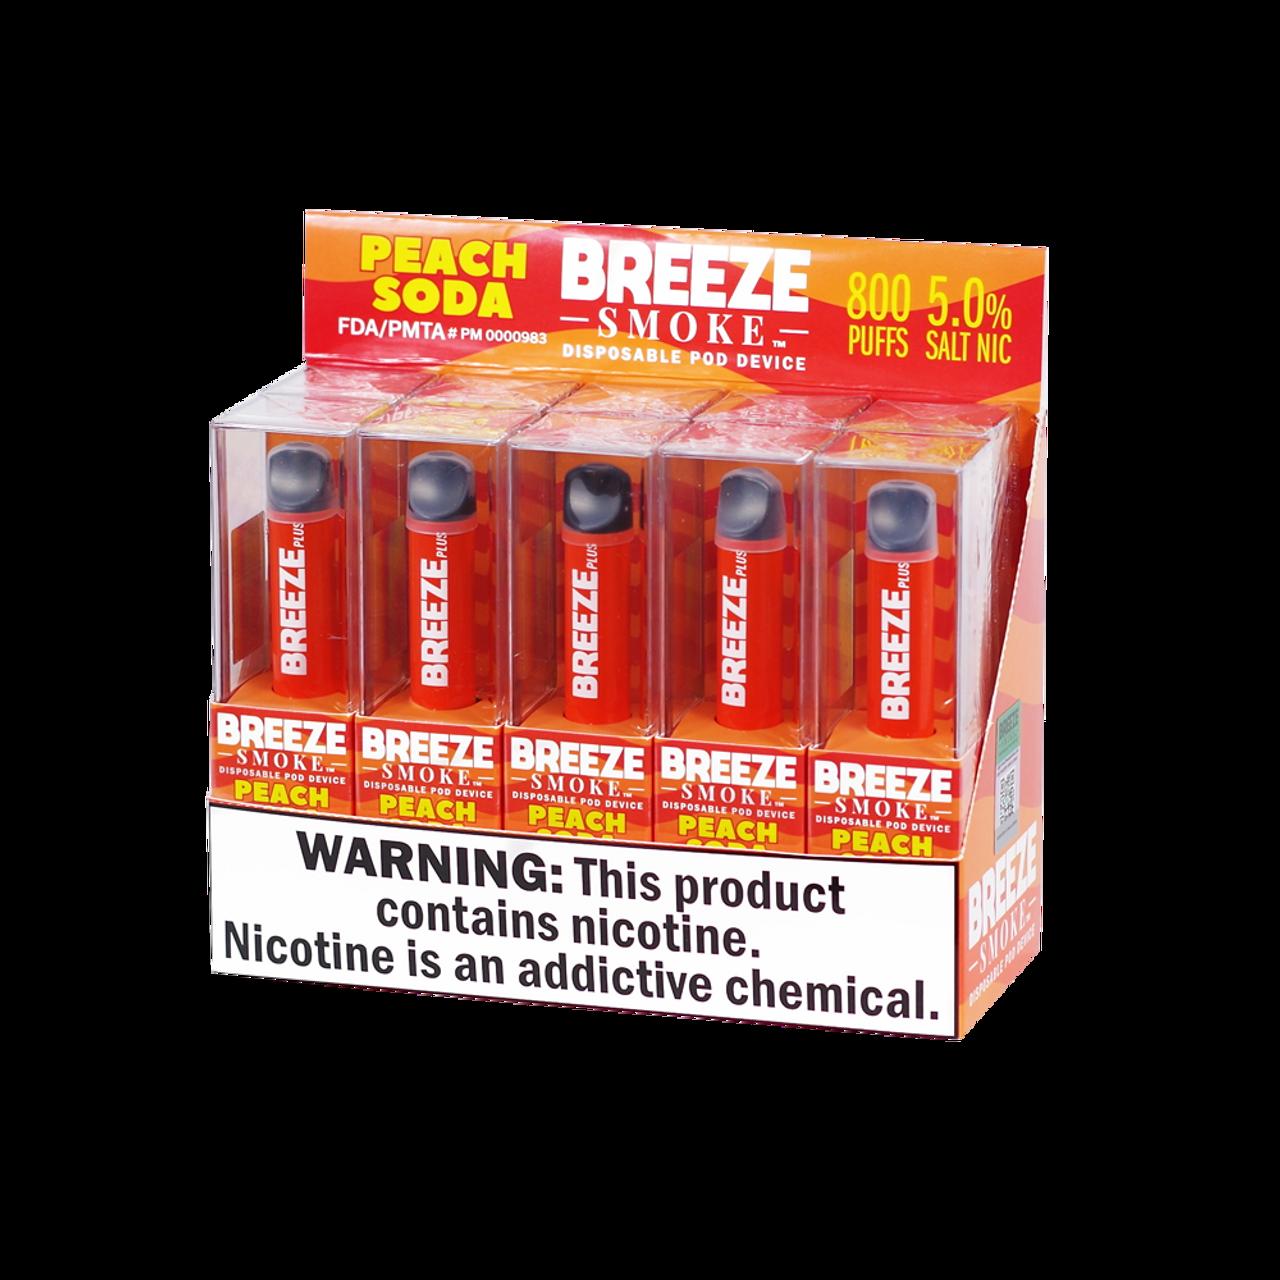 Breeze Breeze Plus Disposable - 5percent 800 Puffs - 10pk at The Cloud Supply